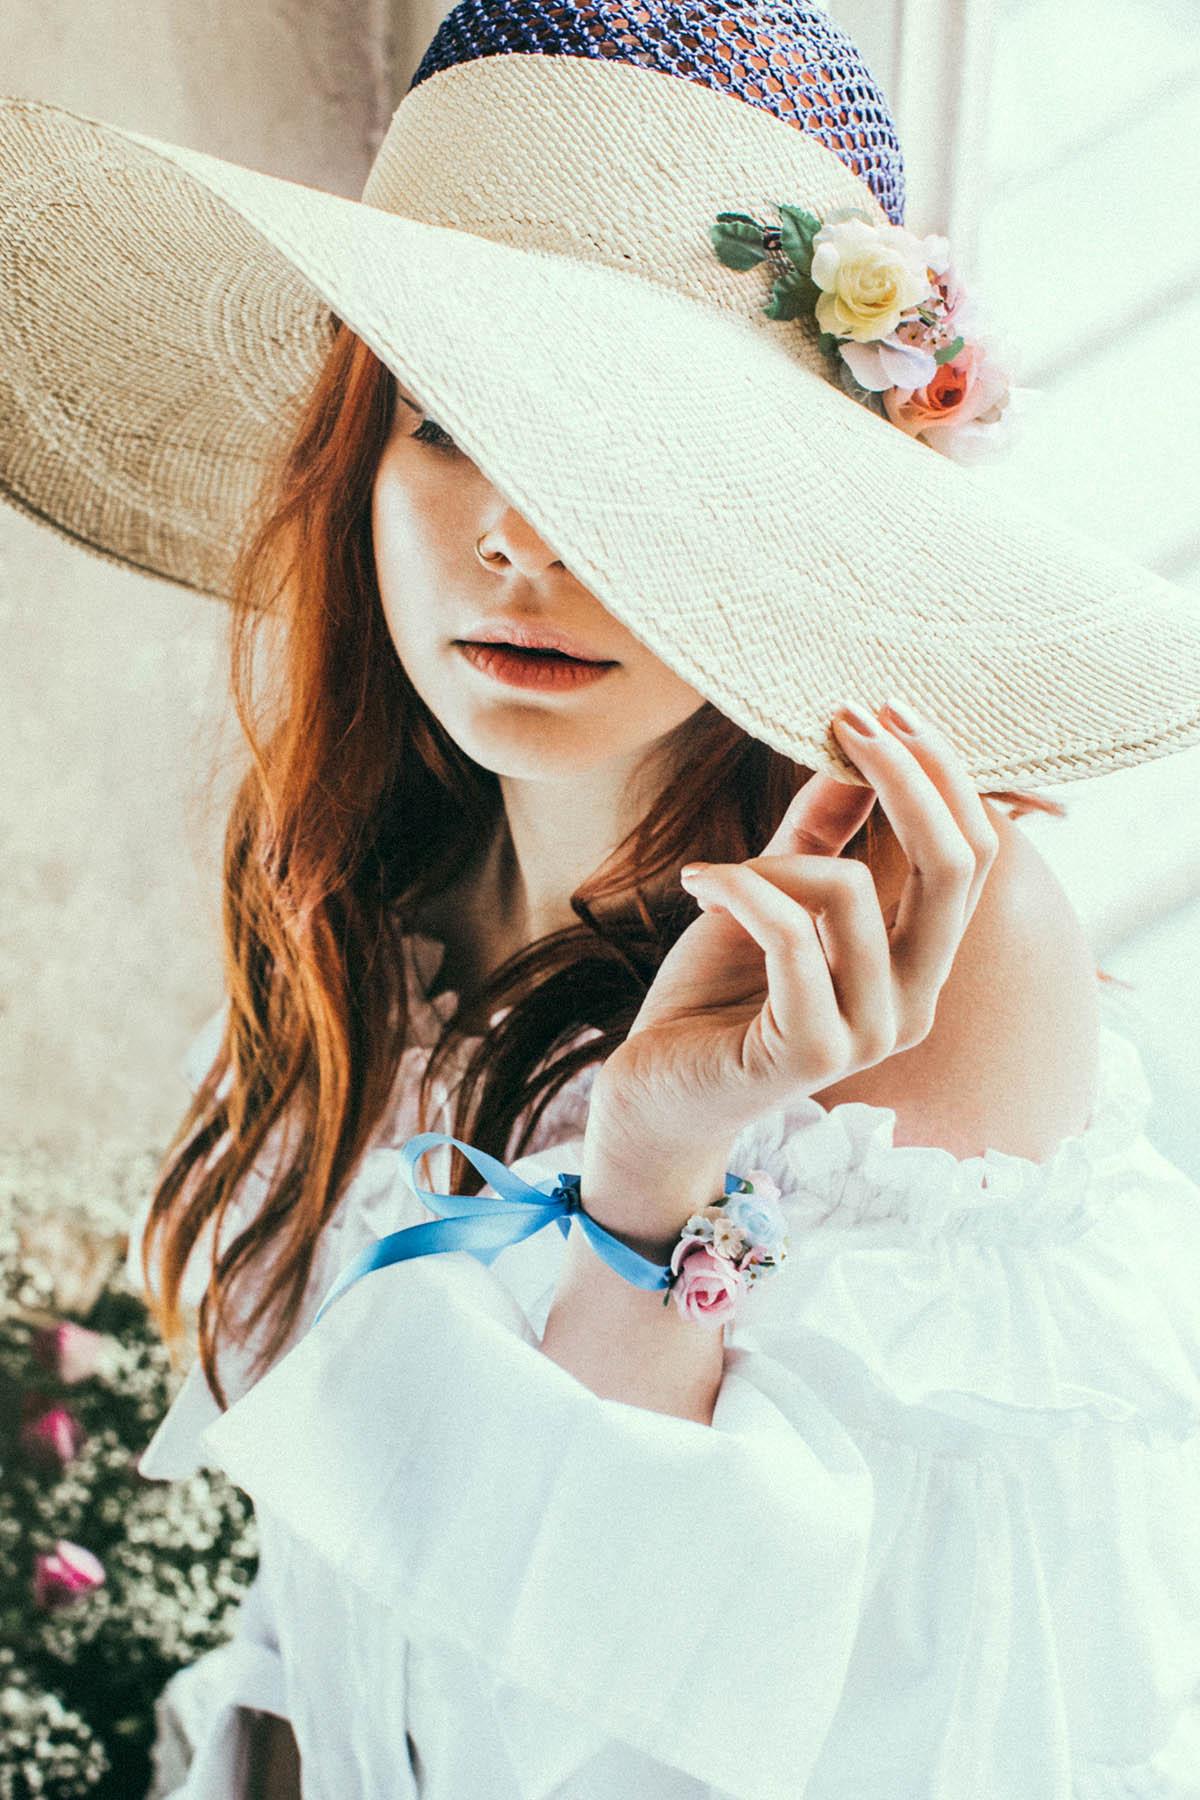 We-Are-Flowergirls_Lookbook_Flowercrown_Blumenkranz_SS17_c_Lupi-Spuma_Web_04.jpg